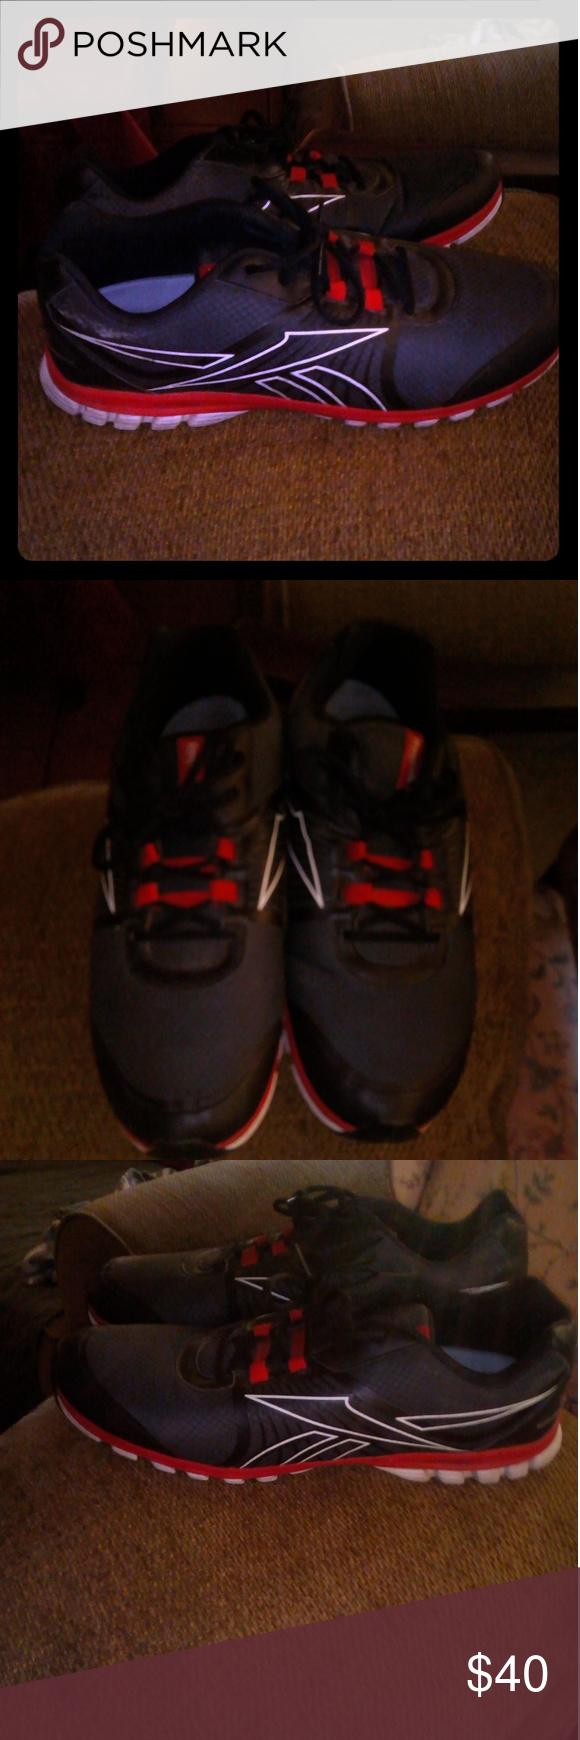 Reebok size 15 mens running shoes